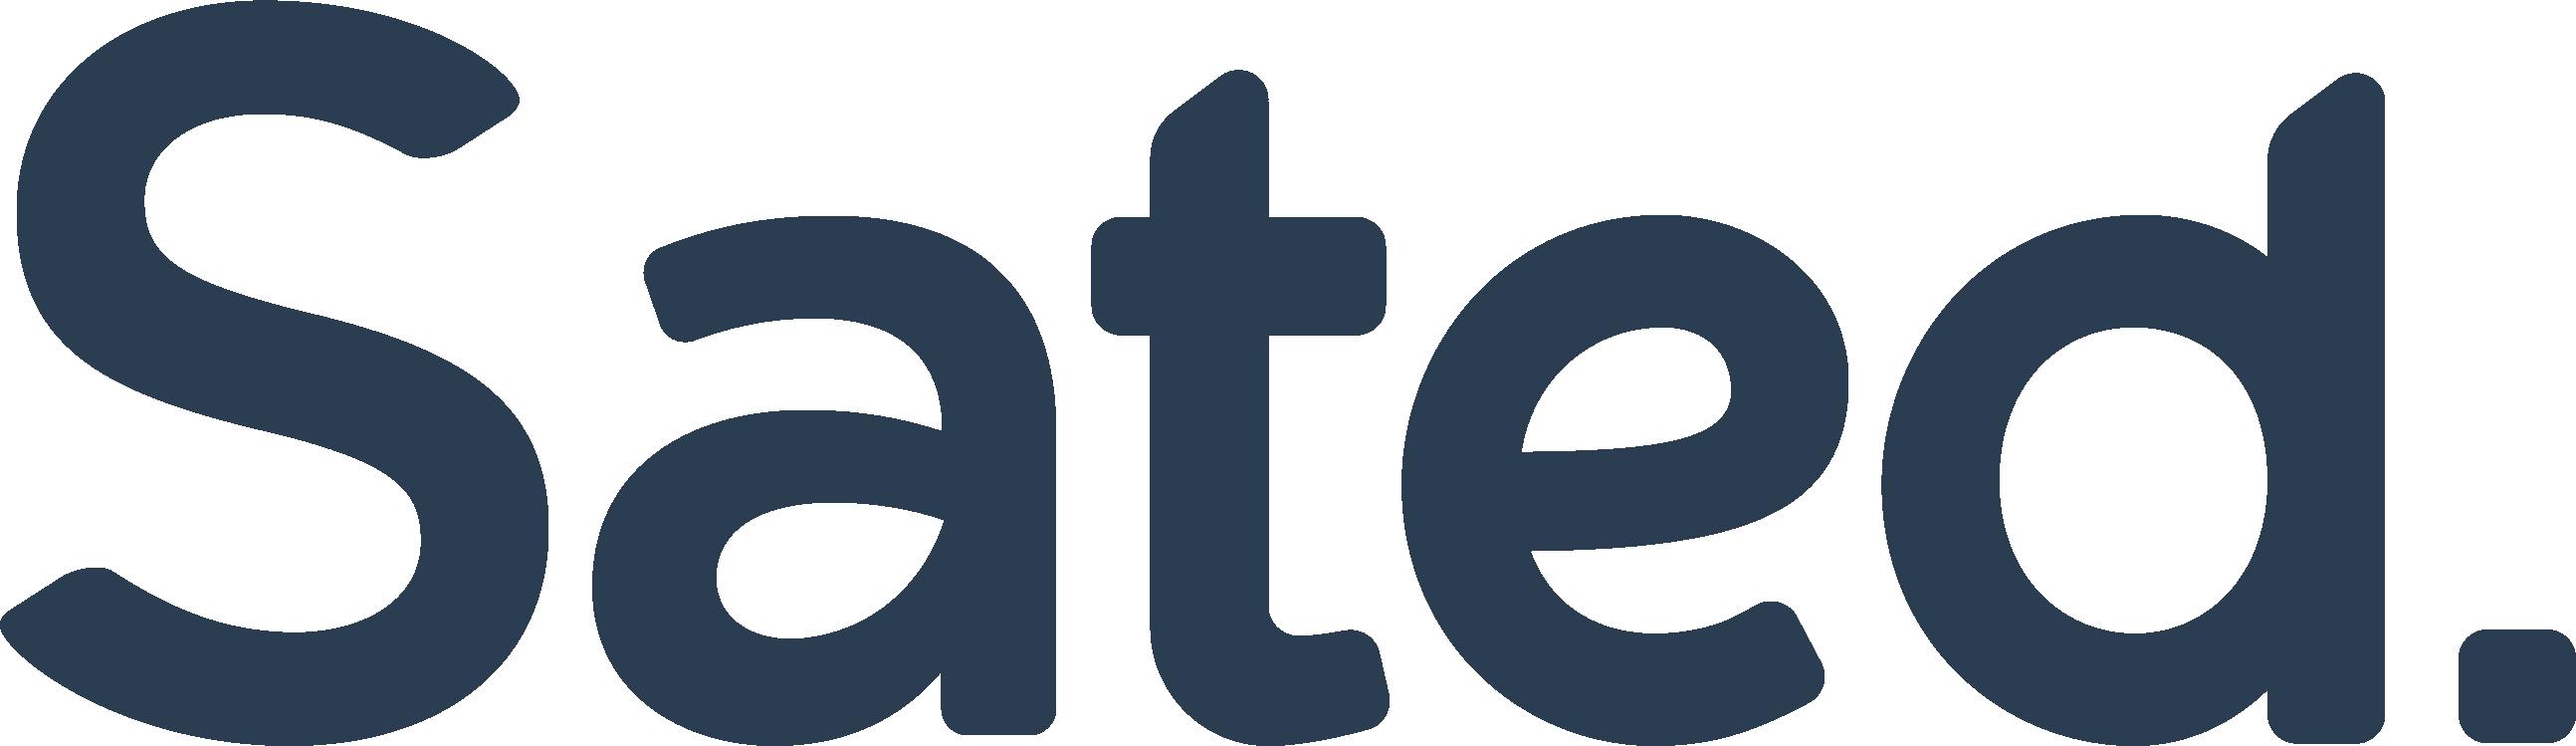 Sated logo